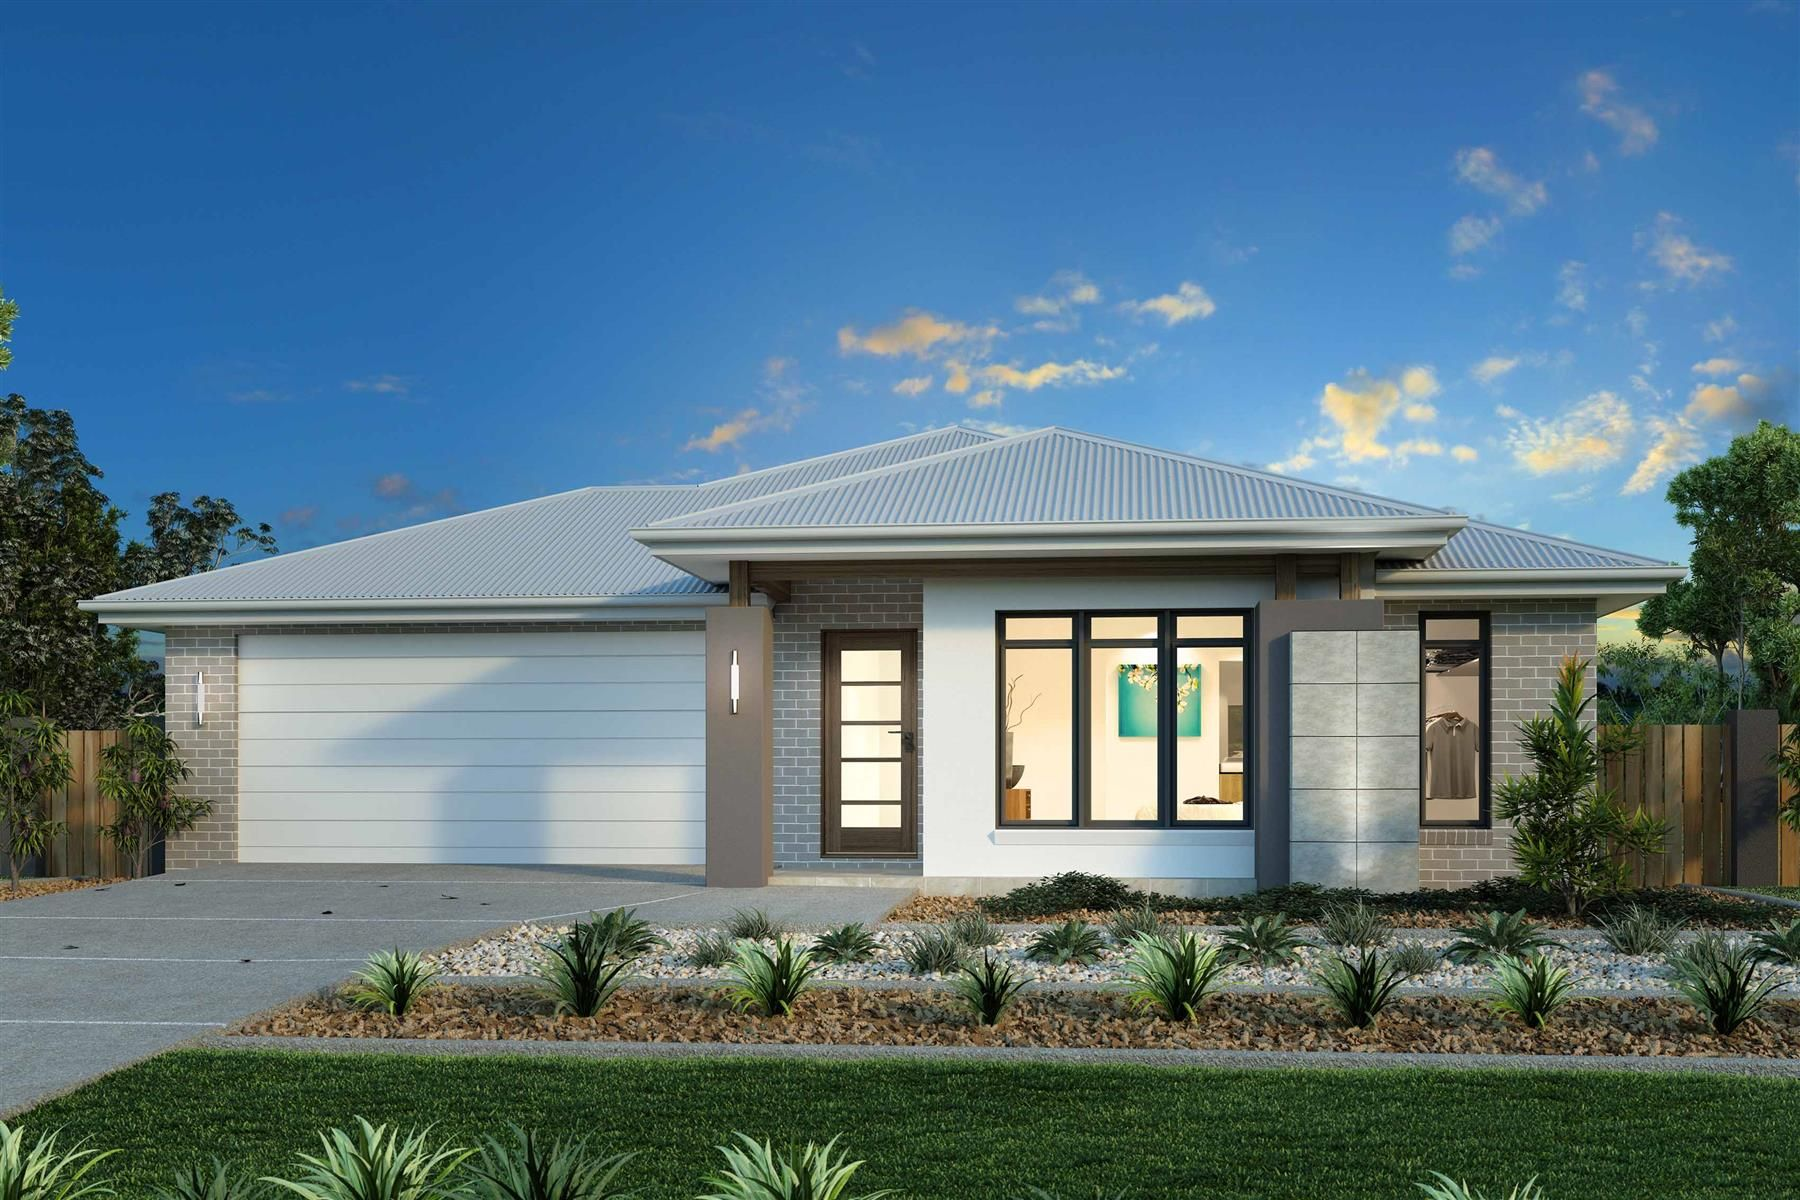 Portside home designs in brisbane central south   gardner homes also rh pinterest